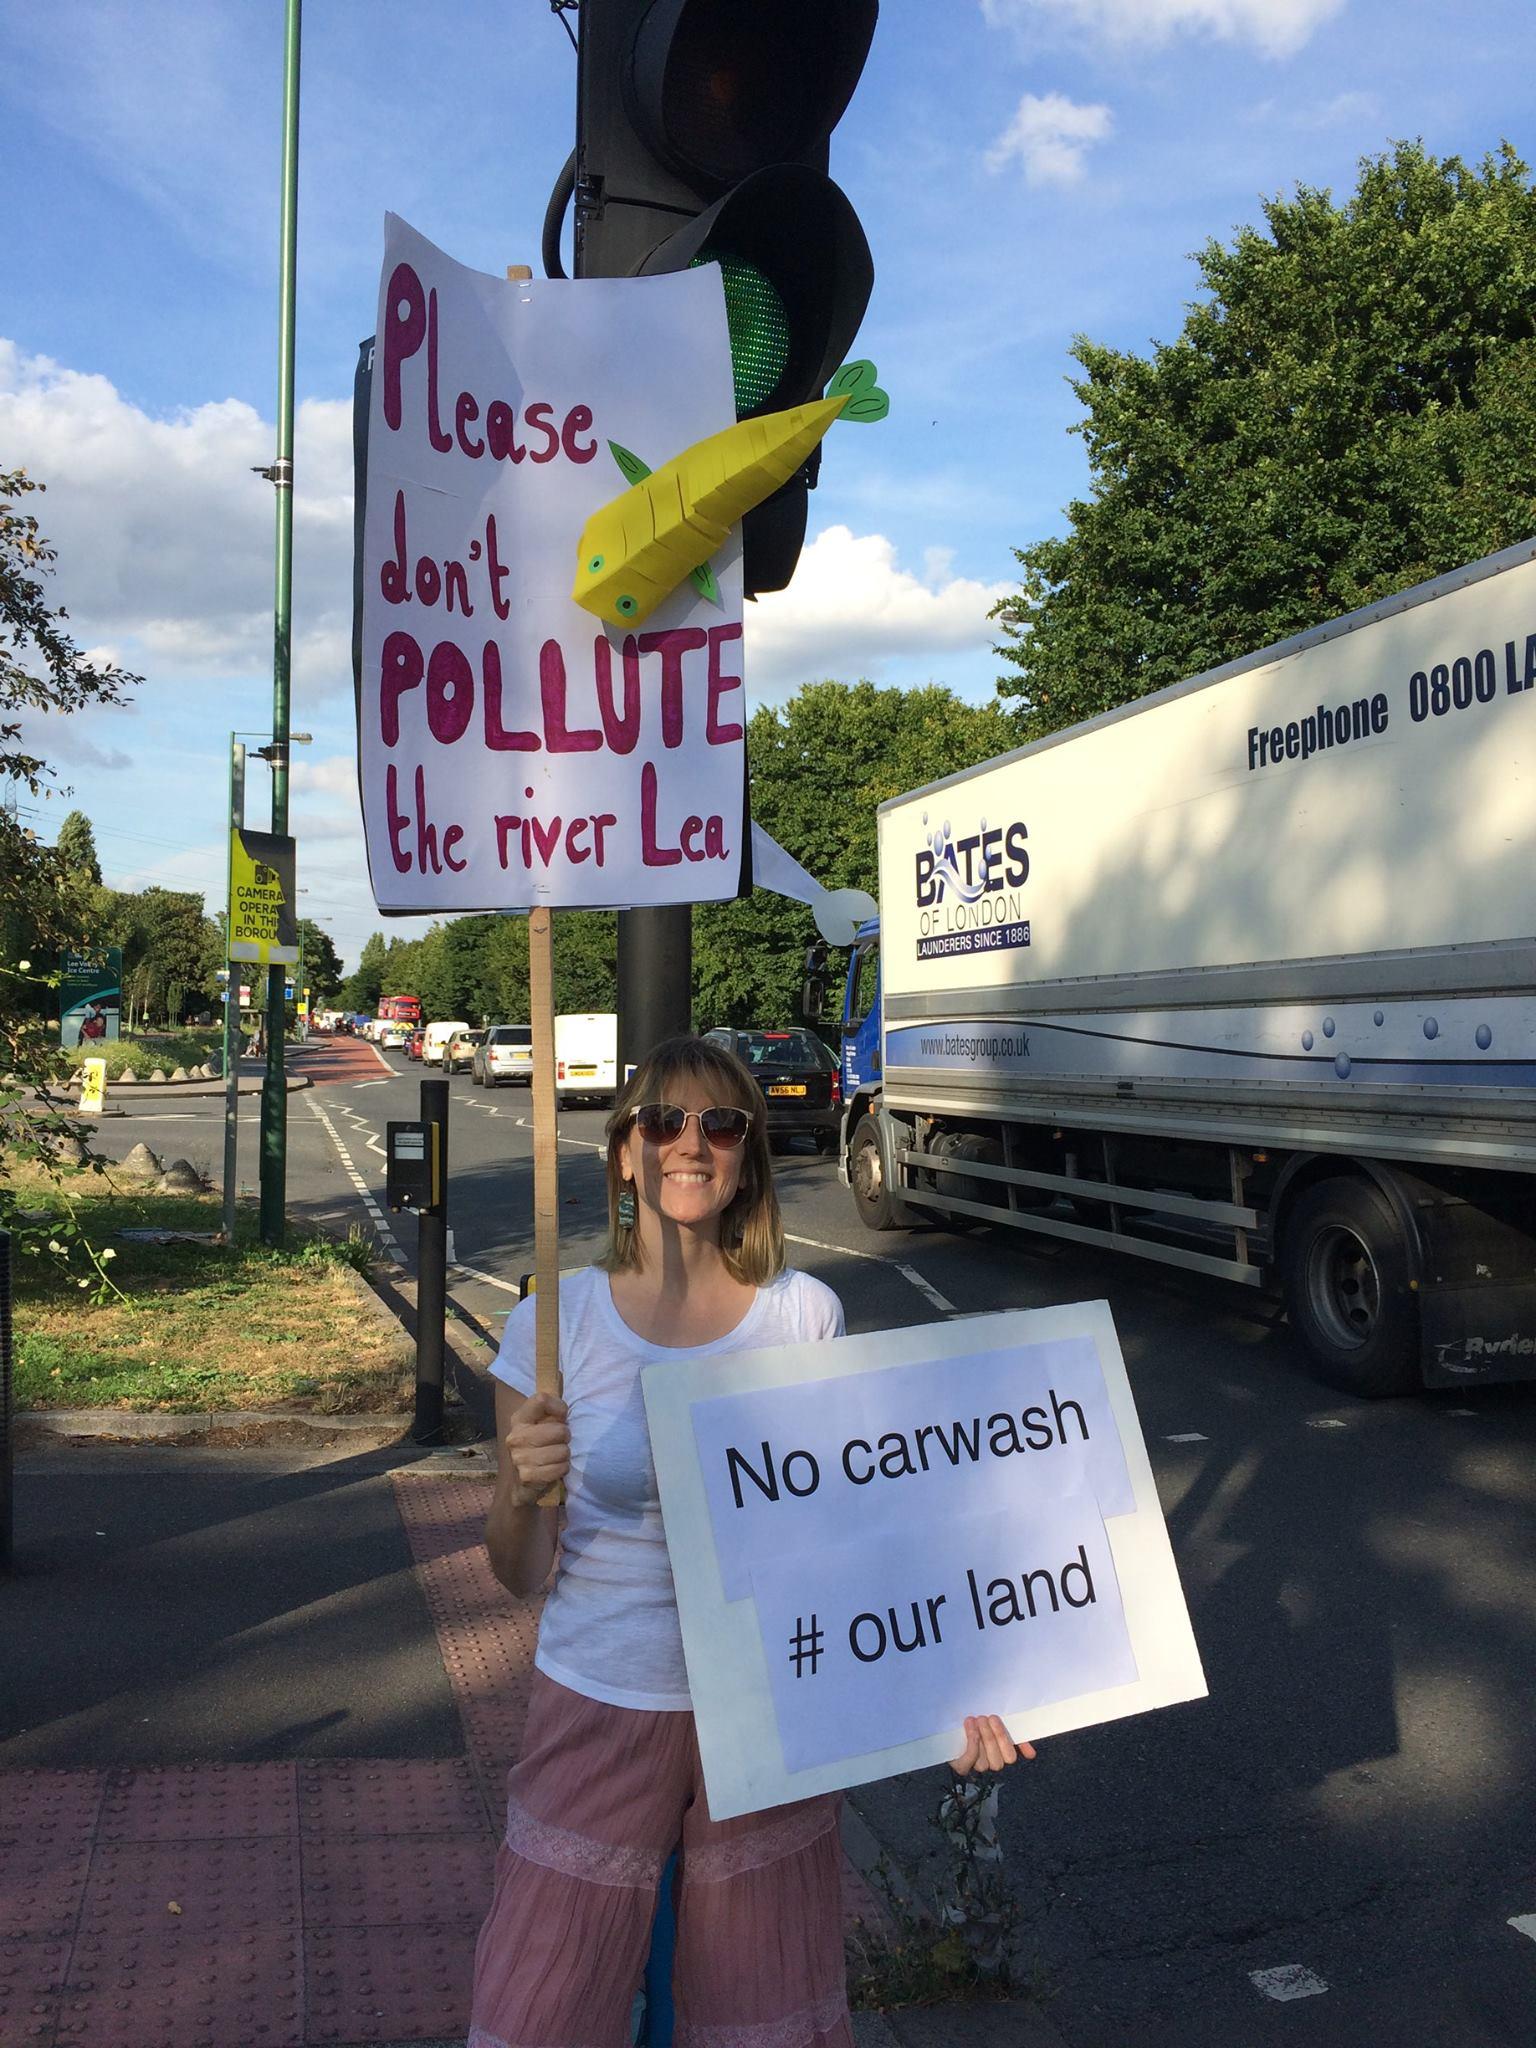 SLM Protest at the car wash